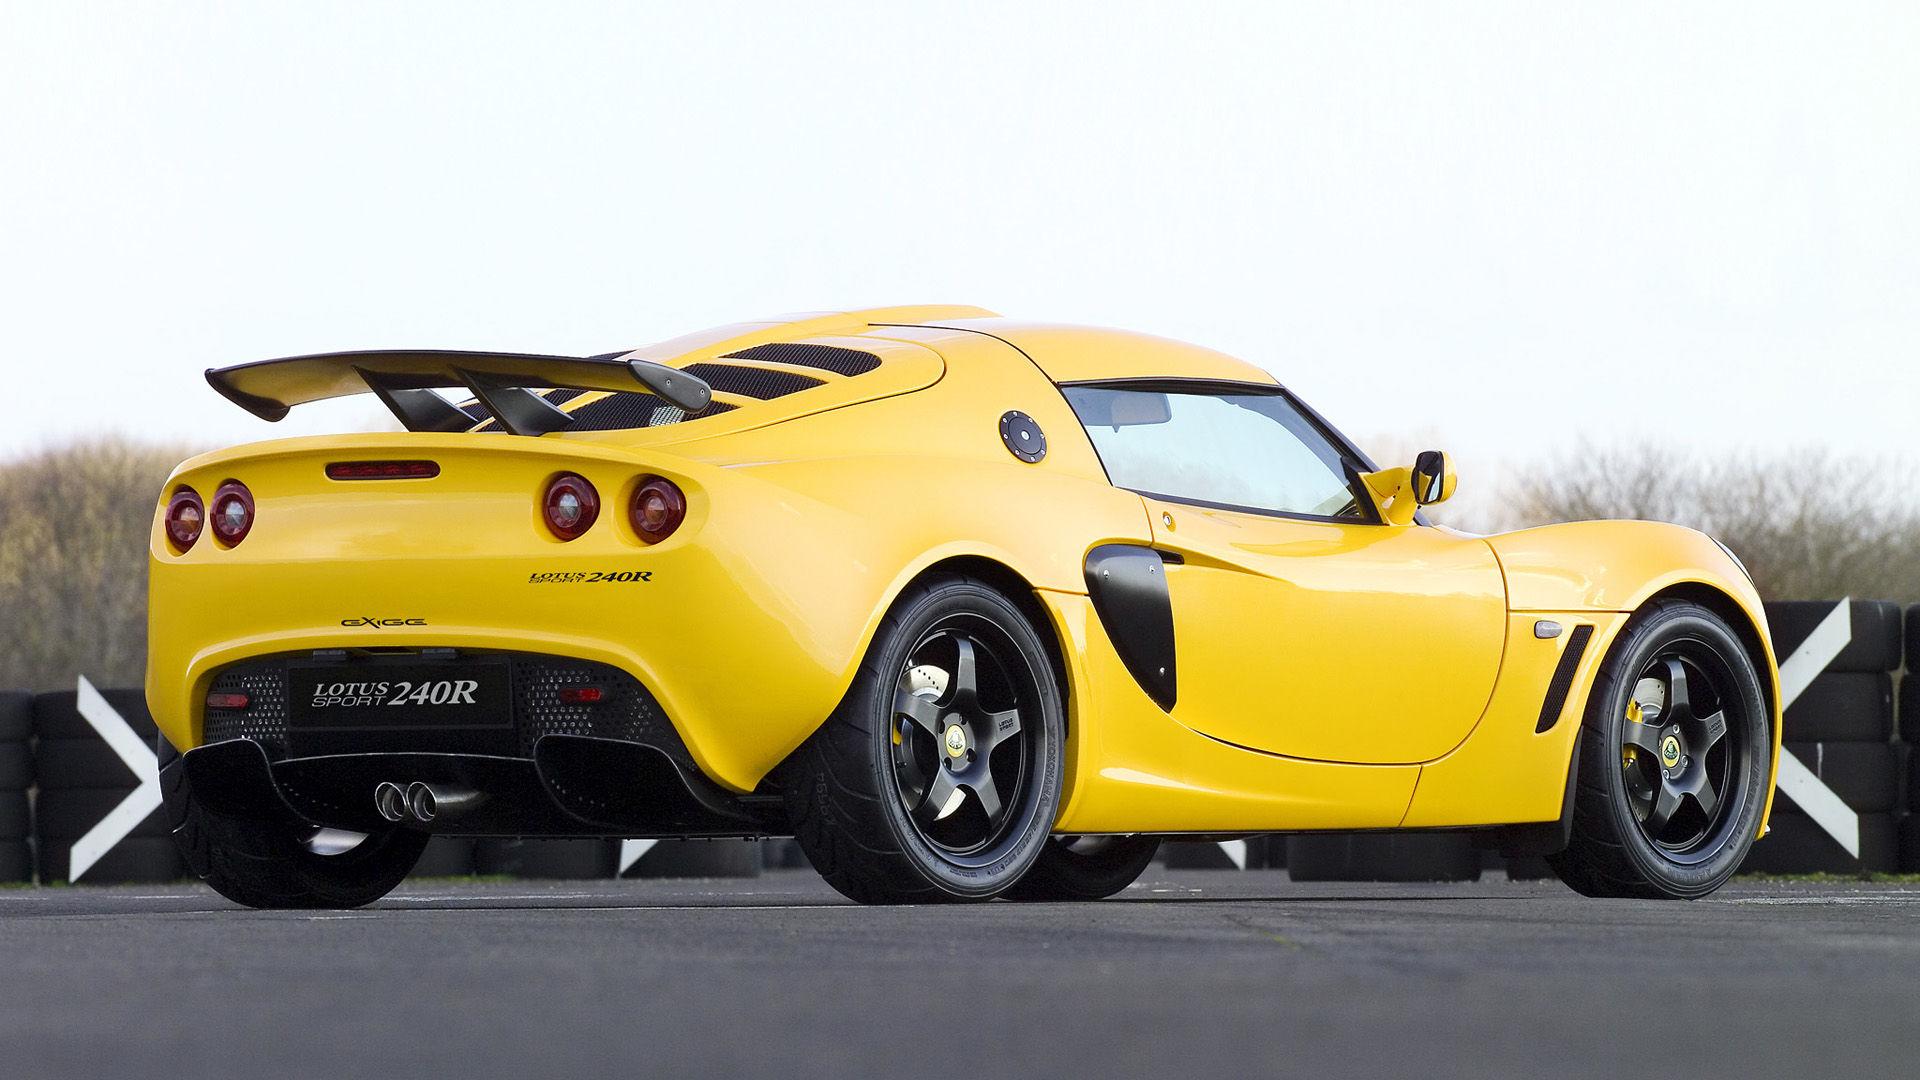 2005 Lotus Exige Sport 240R